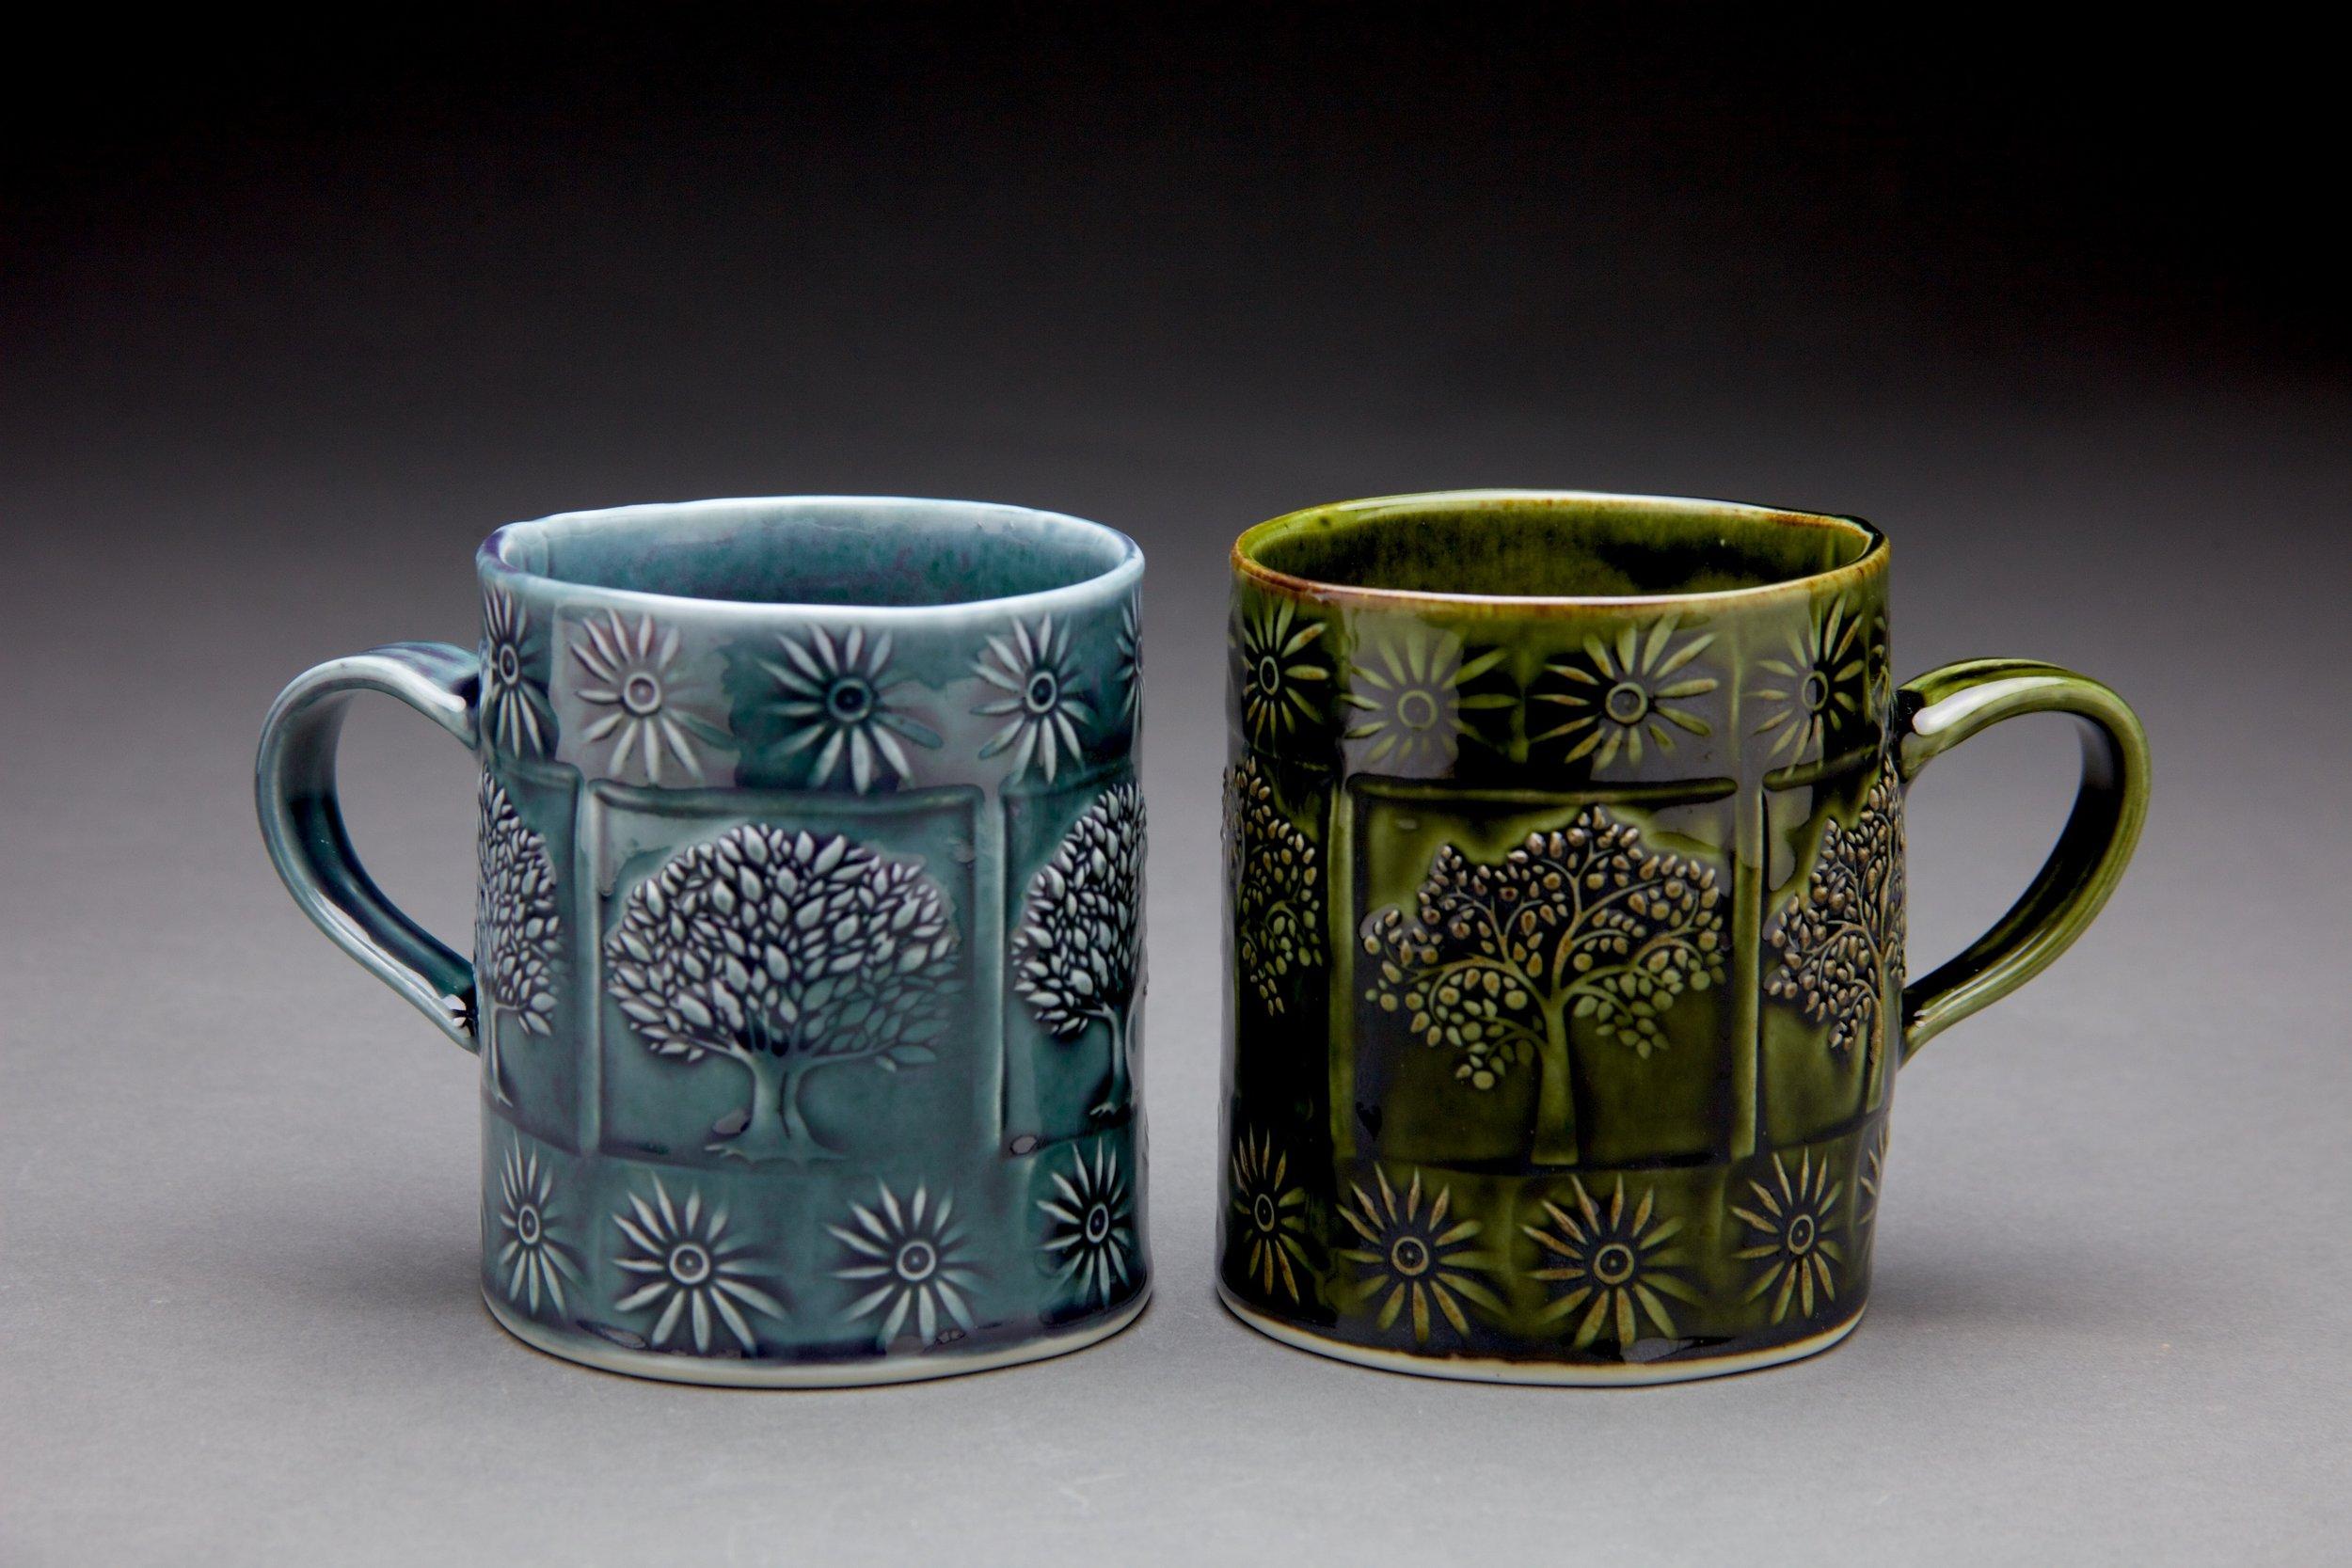 16 oz. mugs. 3.5x3.5x4 in. Persian Blue Glaze (left) Forest Green Glaze (right)